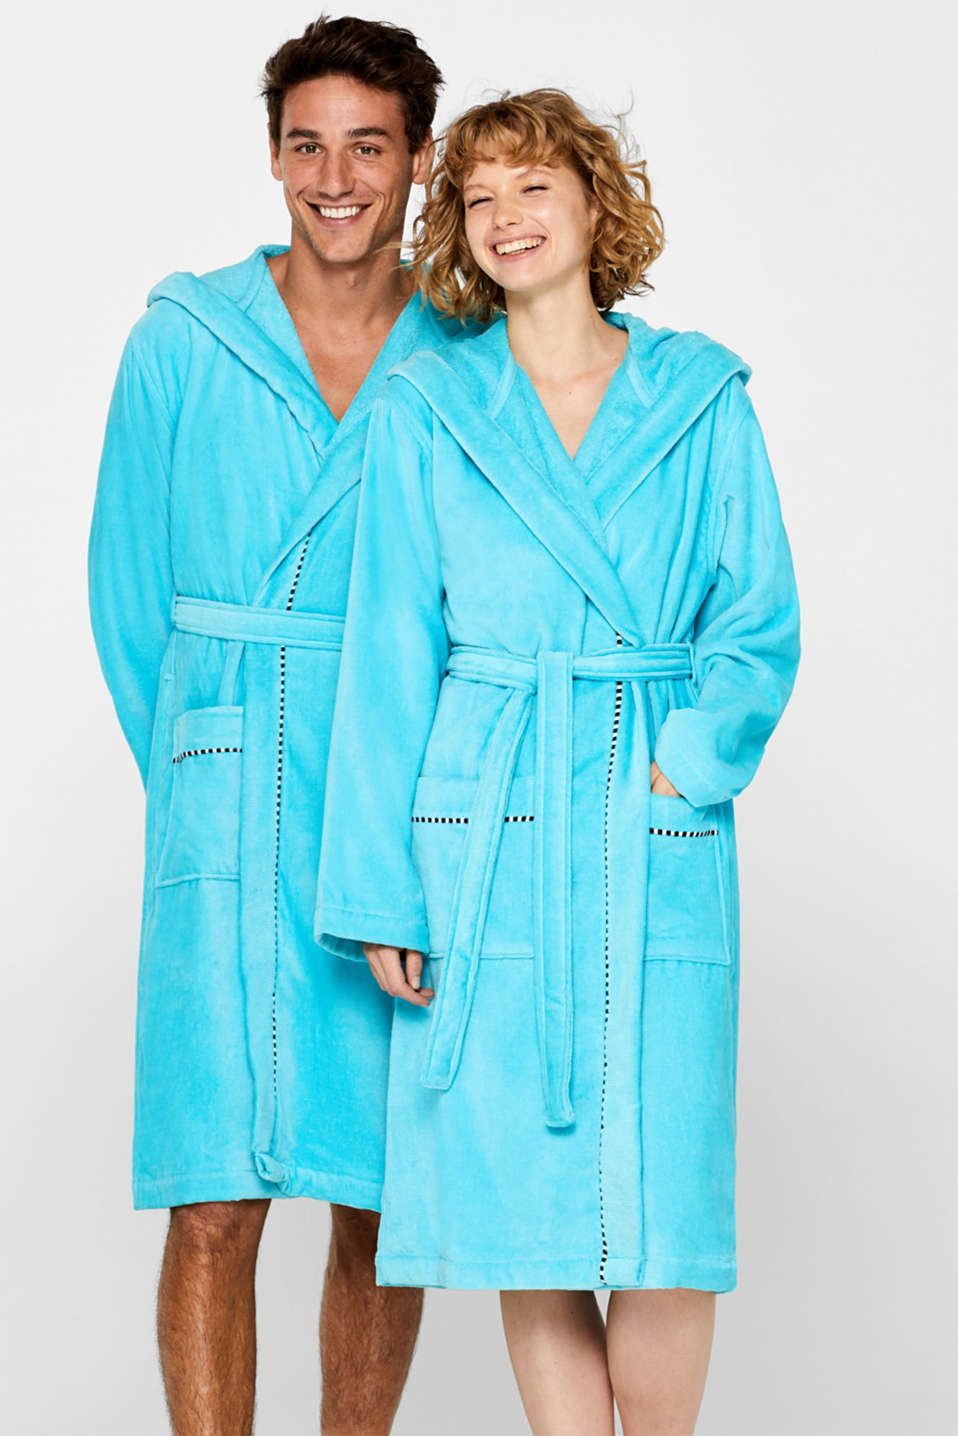 Unisex bathrobe made of 100% cotton, TURQUOISE, detail image number 0